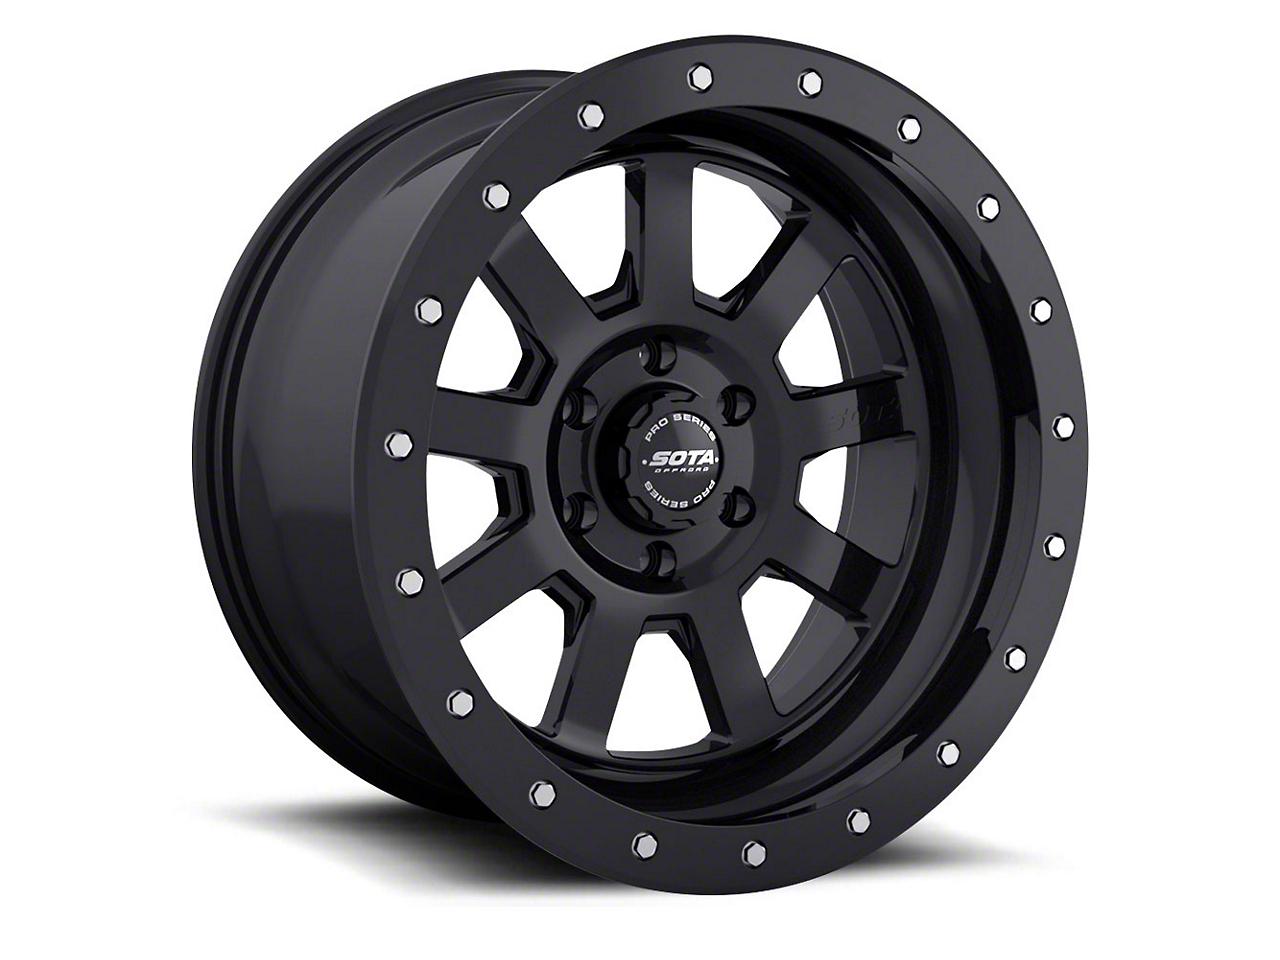 SOTA Off Road S.S.D. Stealth Black Wheel - 17x8.5 (07-18 Jeep Wrangler JK; 2018 Jeep Wrangler JL)